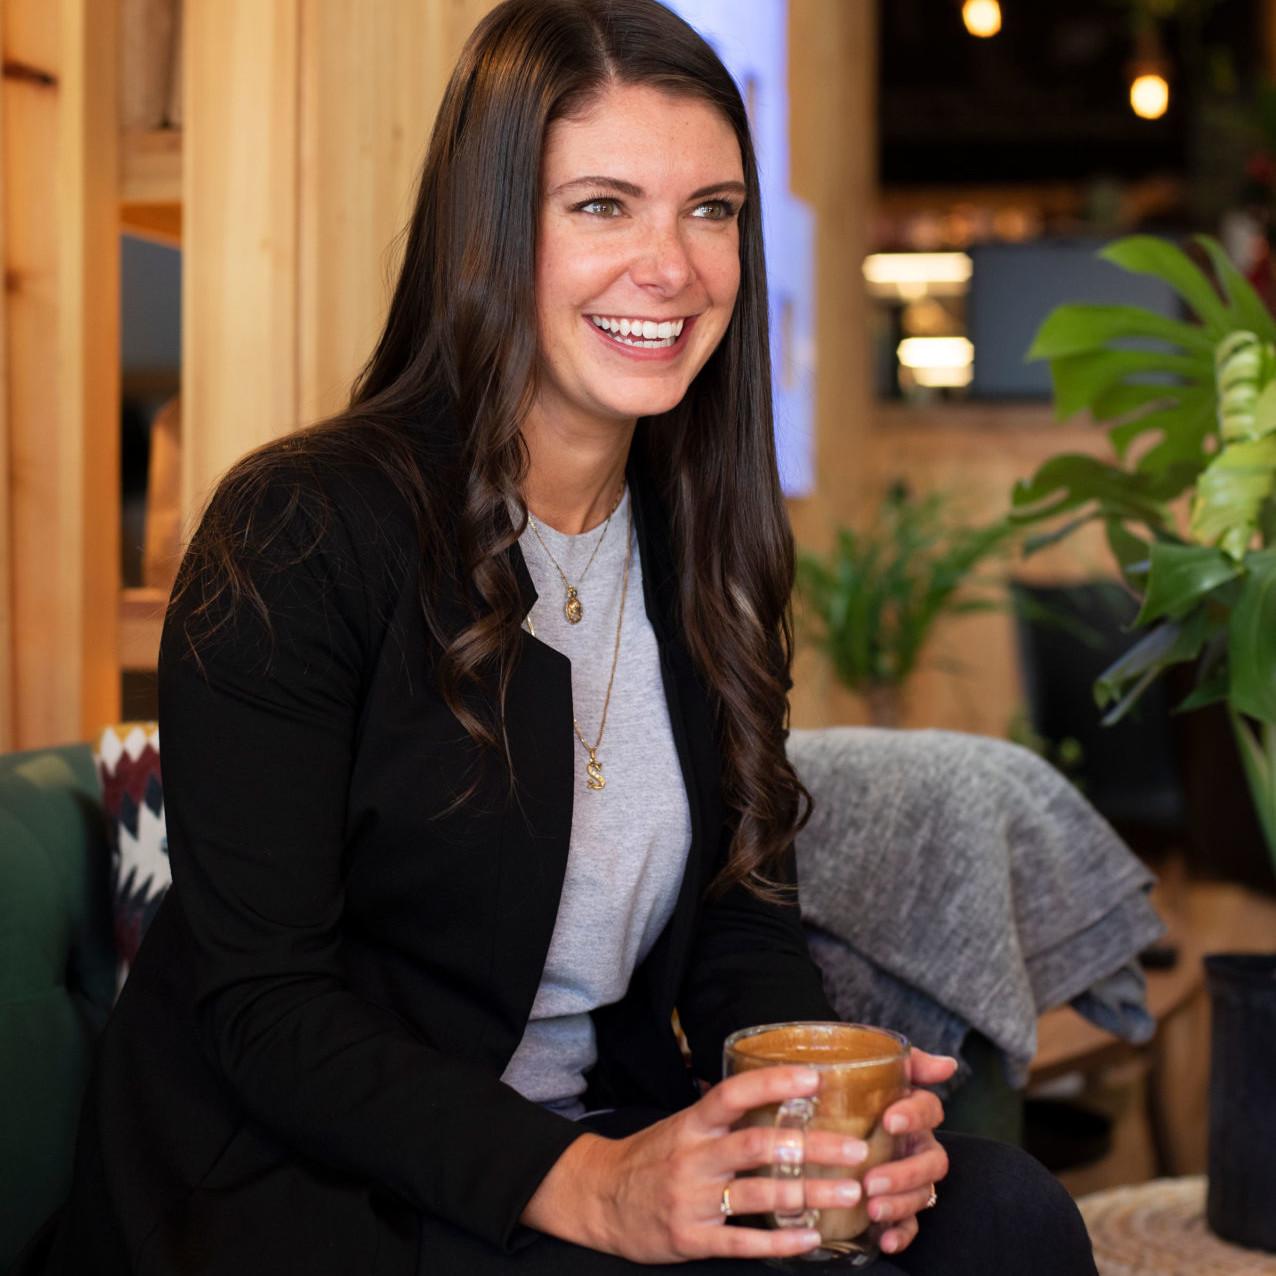 Sarah-Eve Cossette Designer exterieur 2020